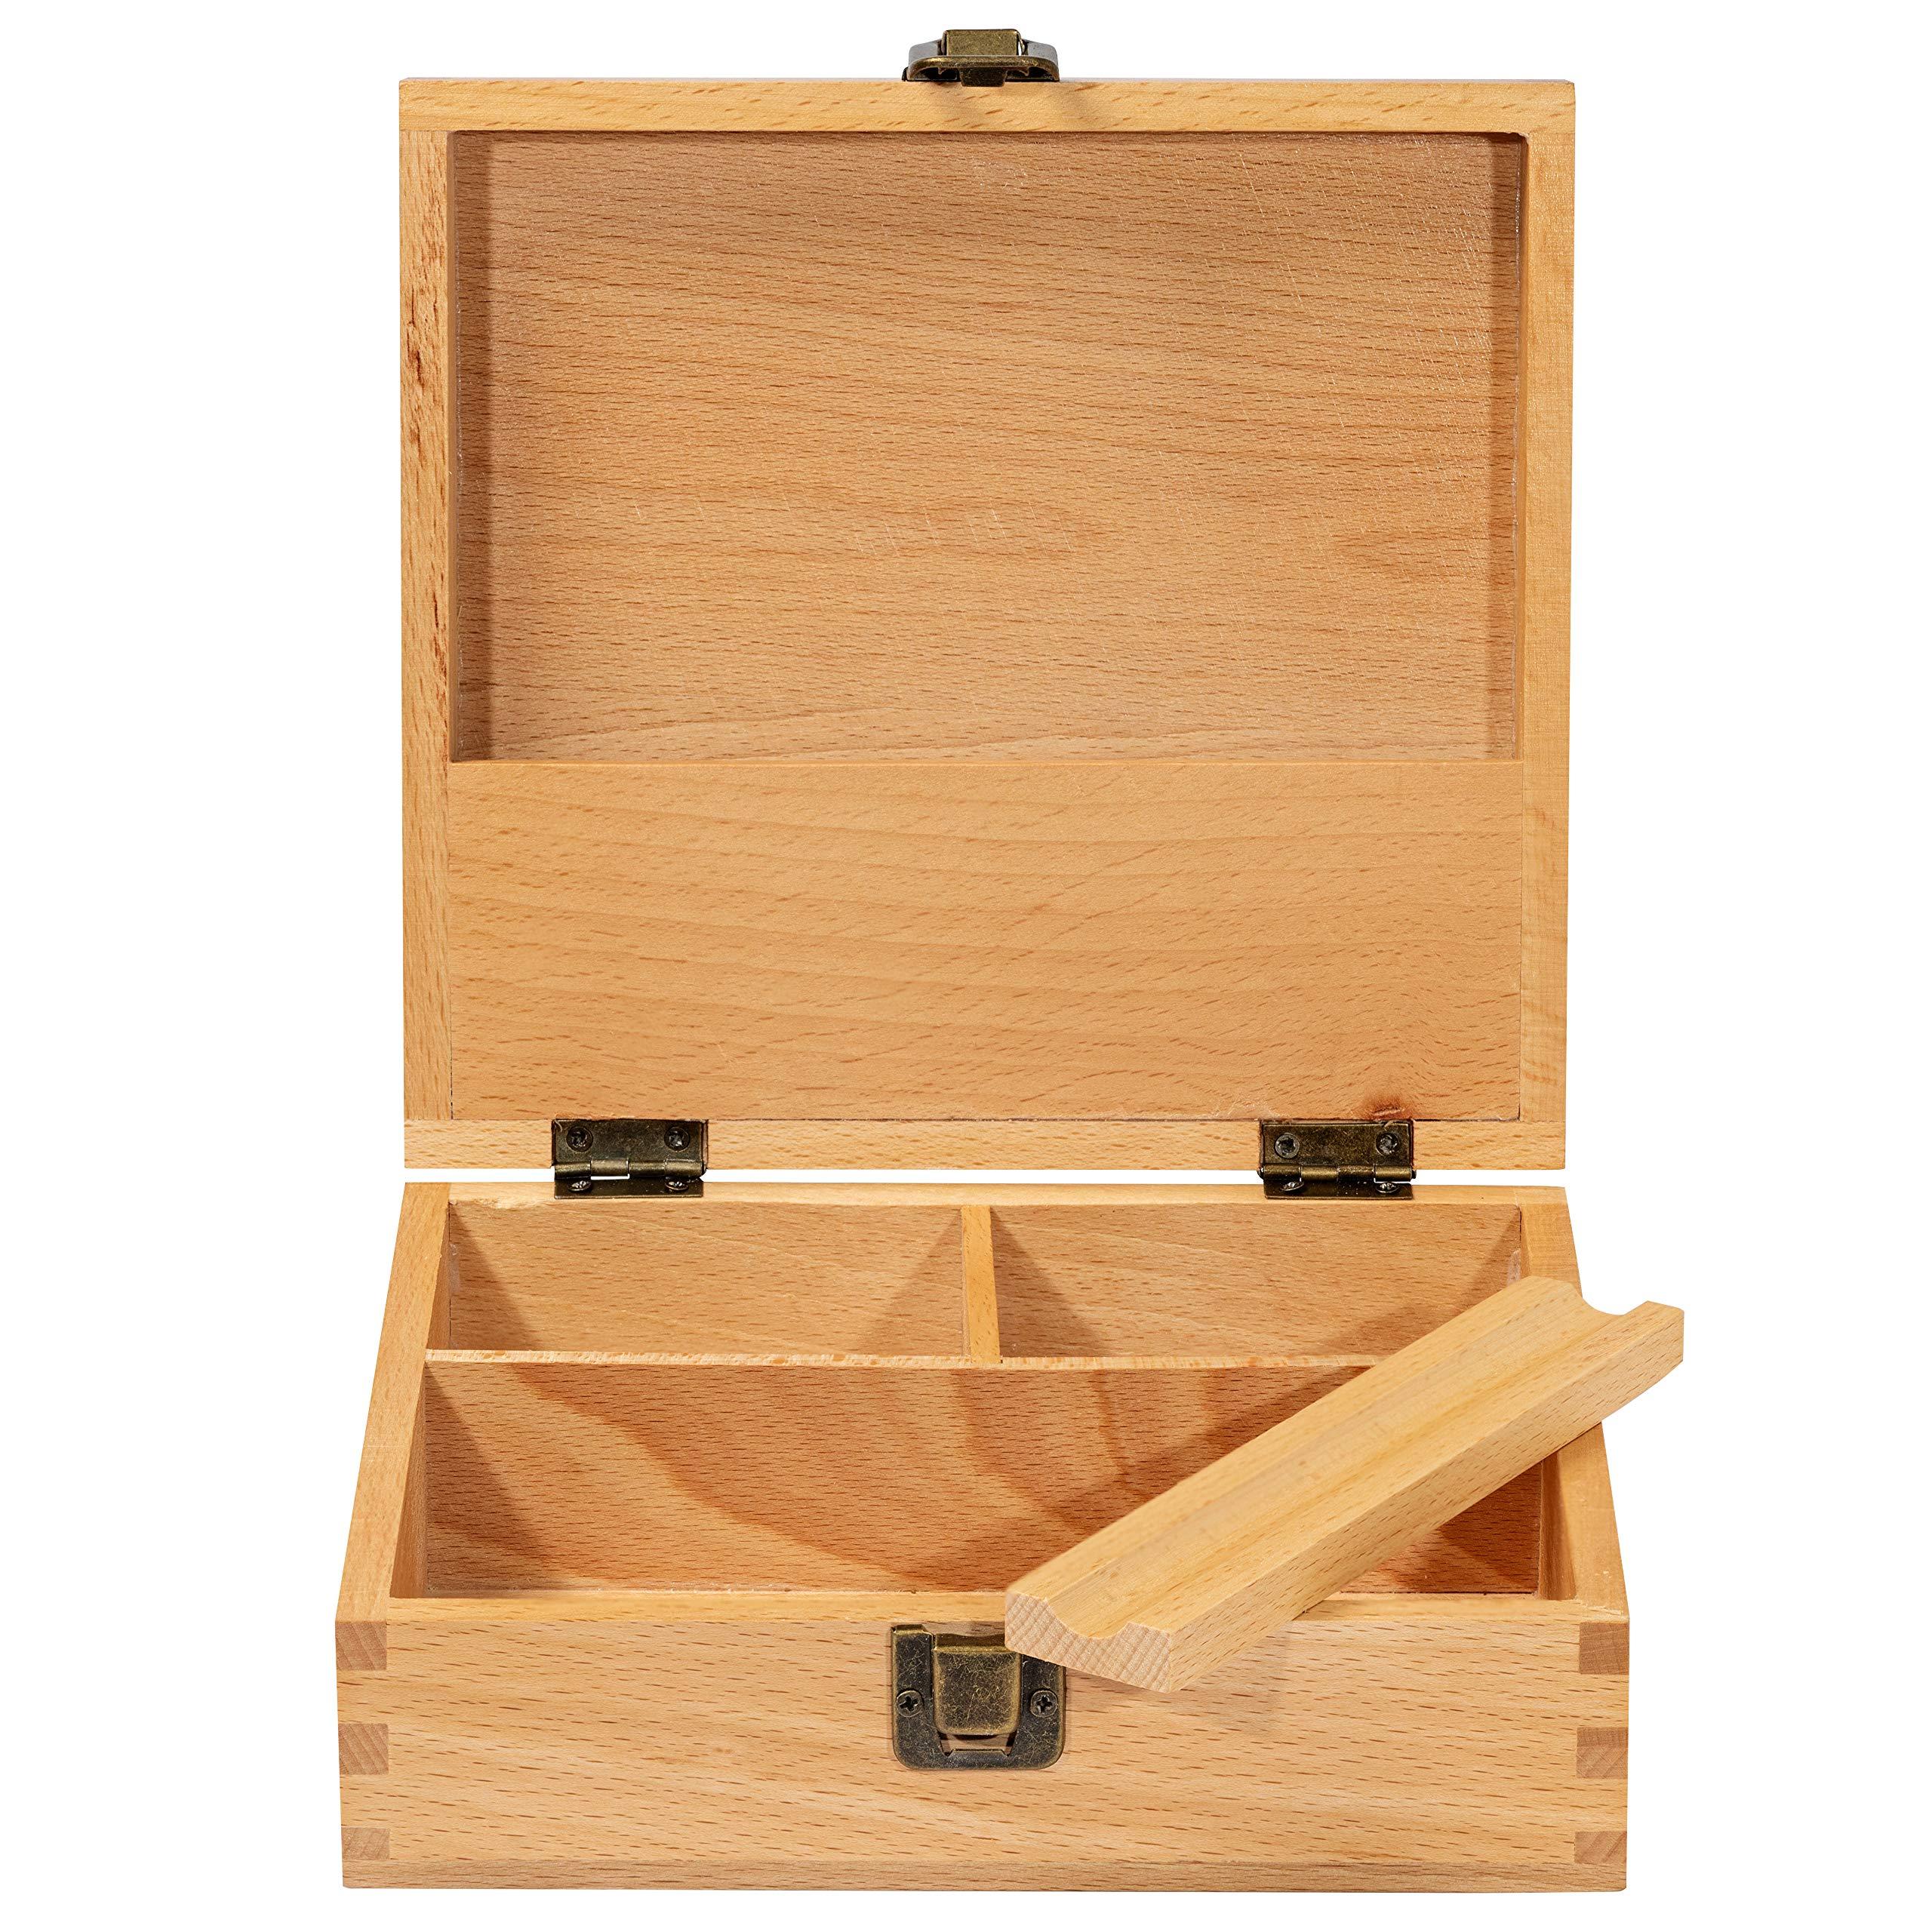 "Stash Box Large with Rolling Tray Combo– Handmade Decorative Stash Box - 7.5"" x 7"" Beech Wood Box - Storage Box"